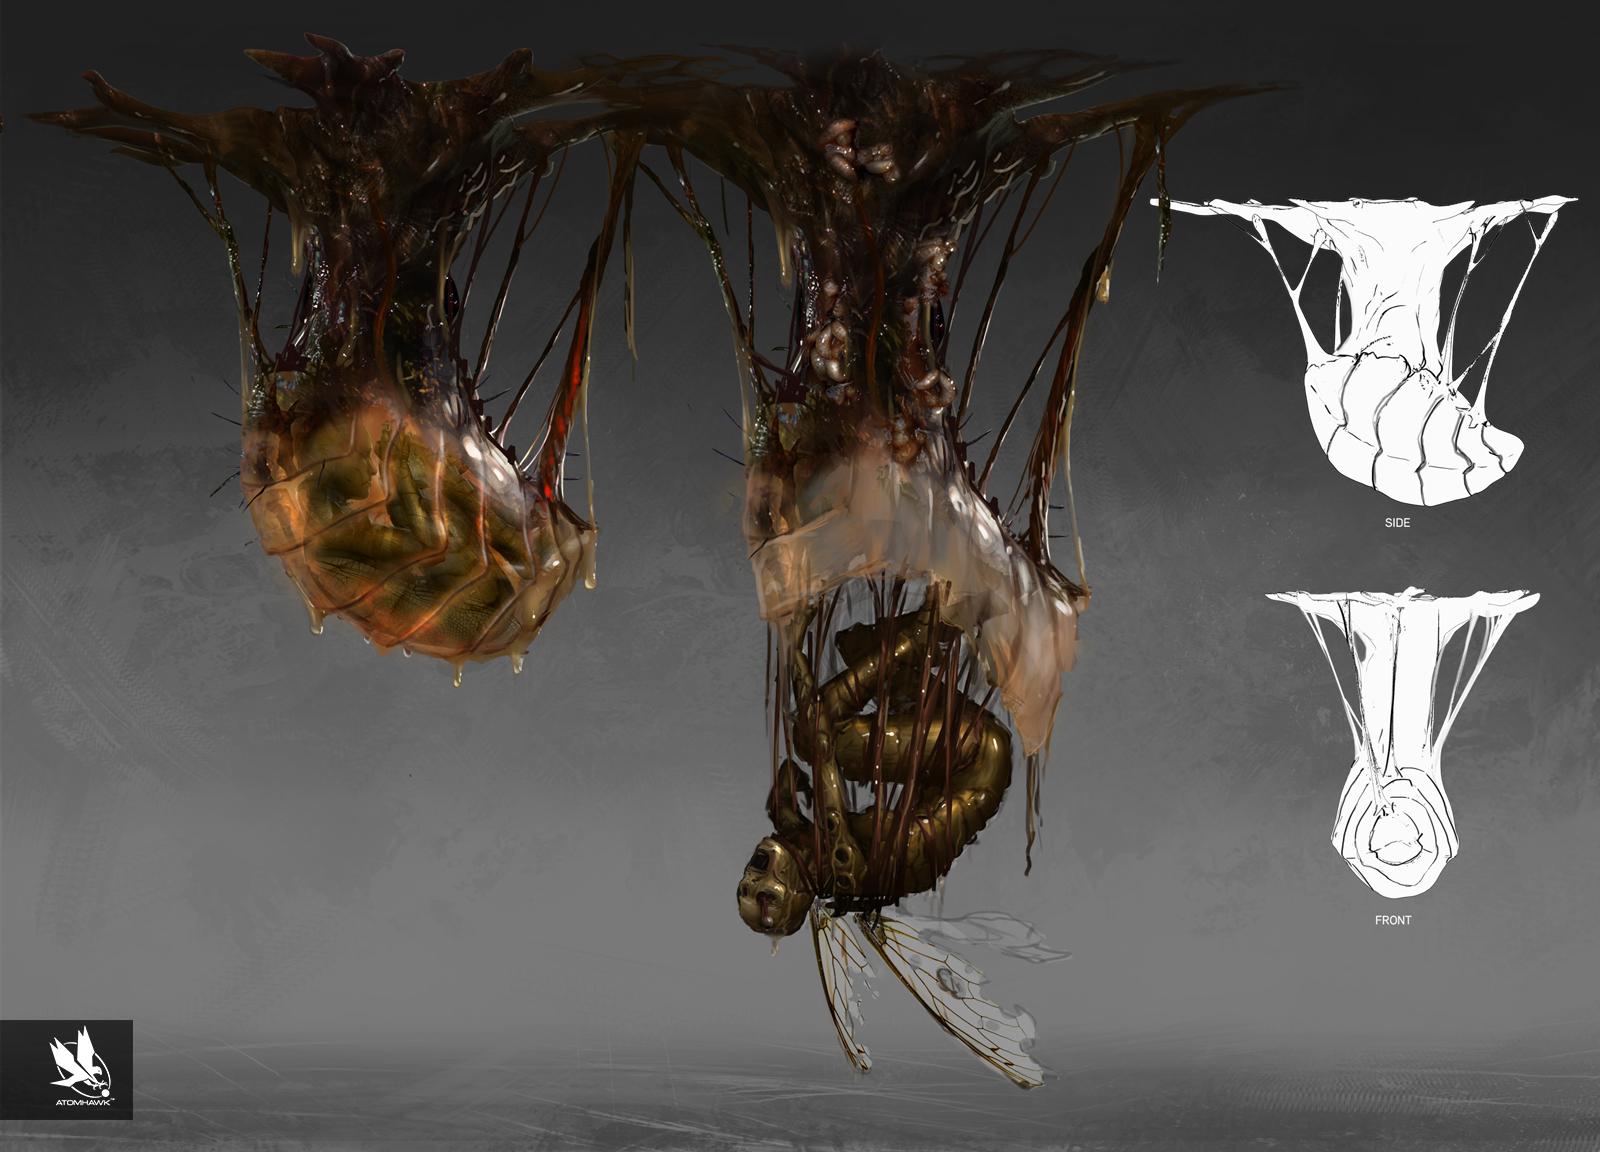 Atomhawk_Warner-Bros-NetherRealm_Mortal-Kombat-11_Concept-Art_Prop-Design_Kytinn-Lost-Hive_Breakout_C.jpg